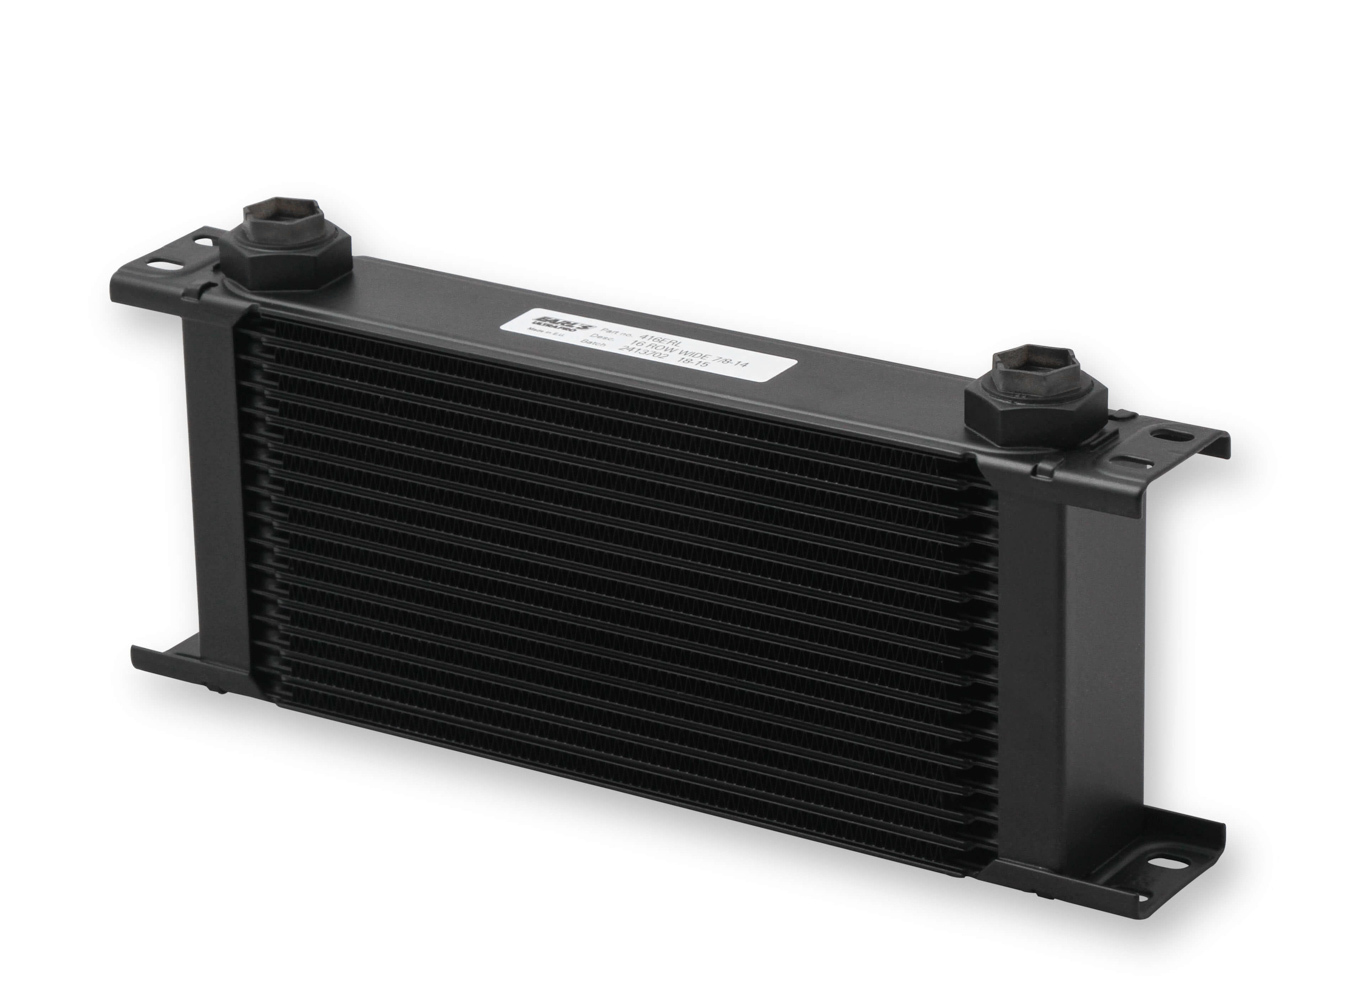 Earls Ultrapro Oil Cooler - 16 Row - Black Finish